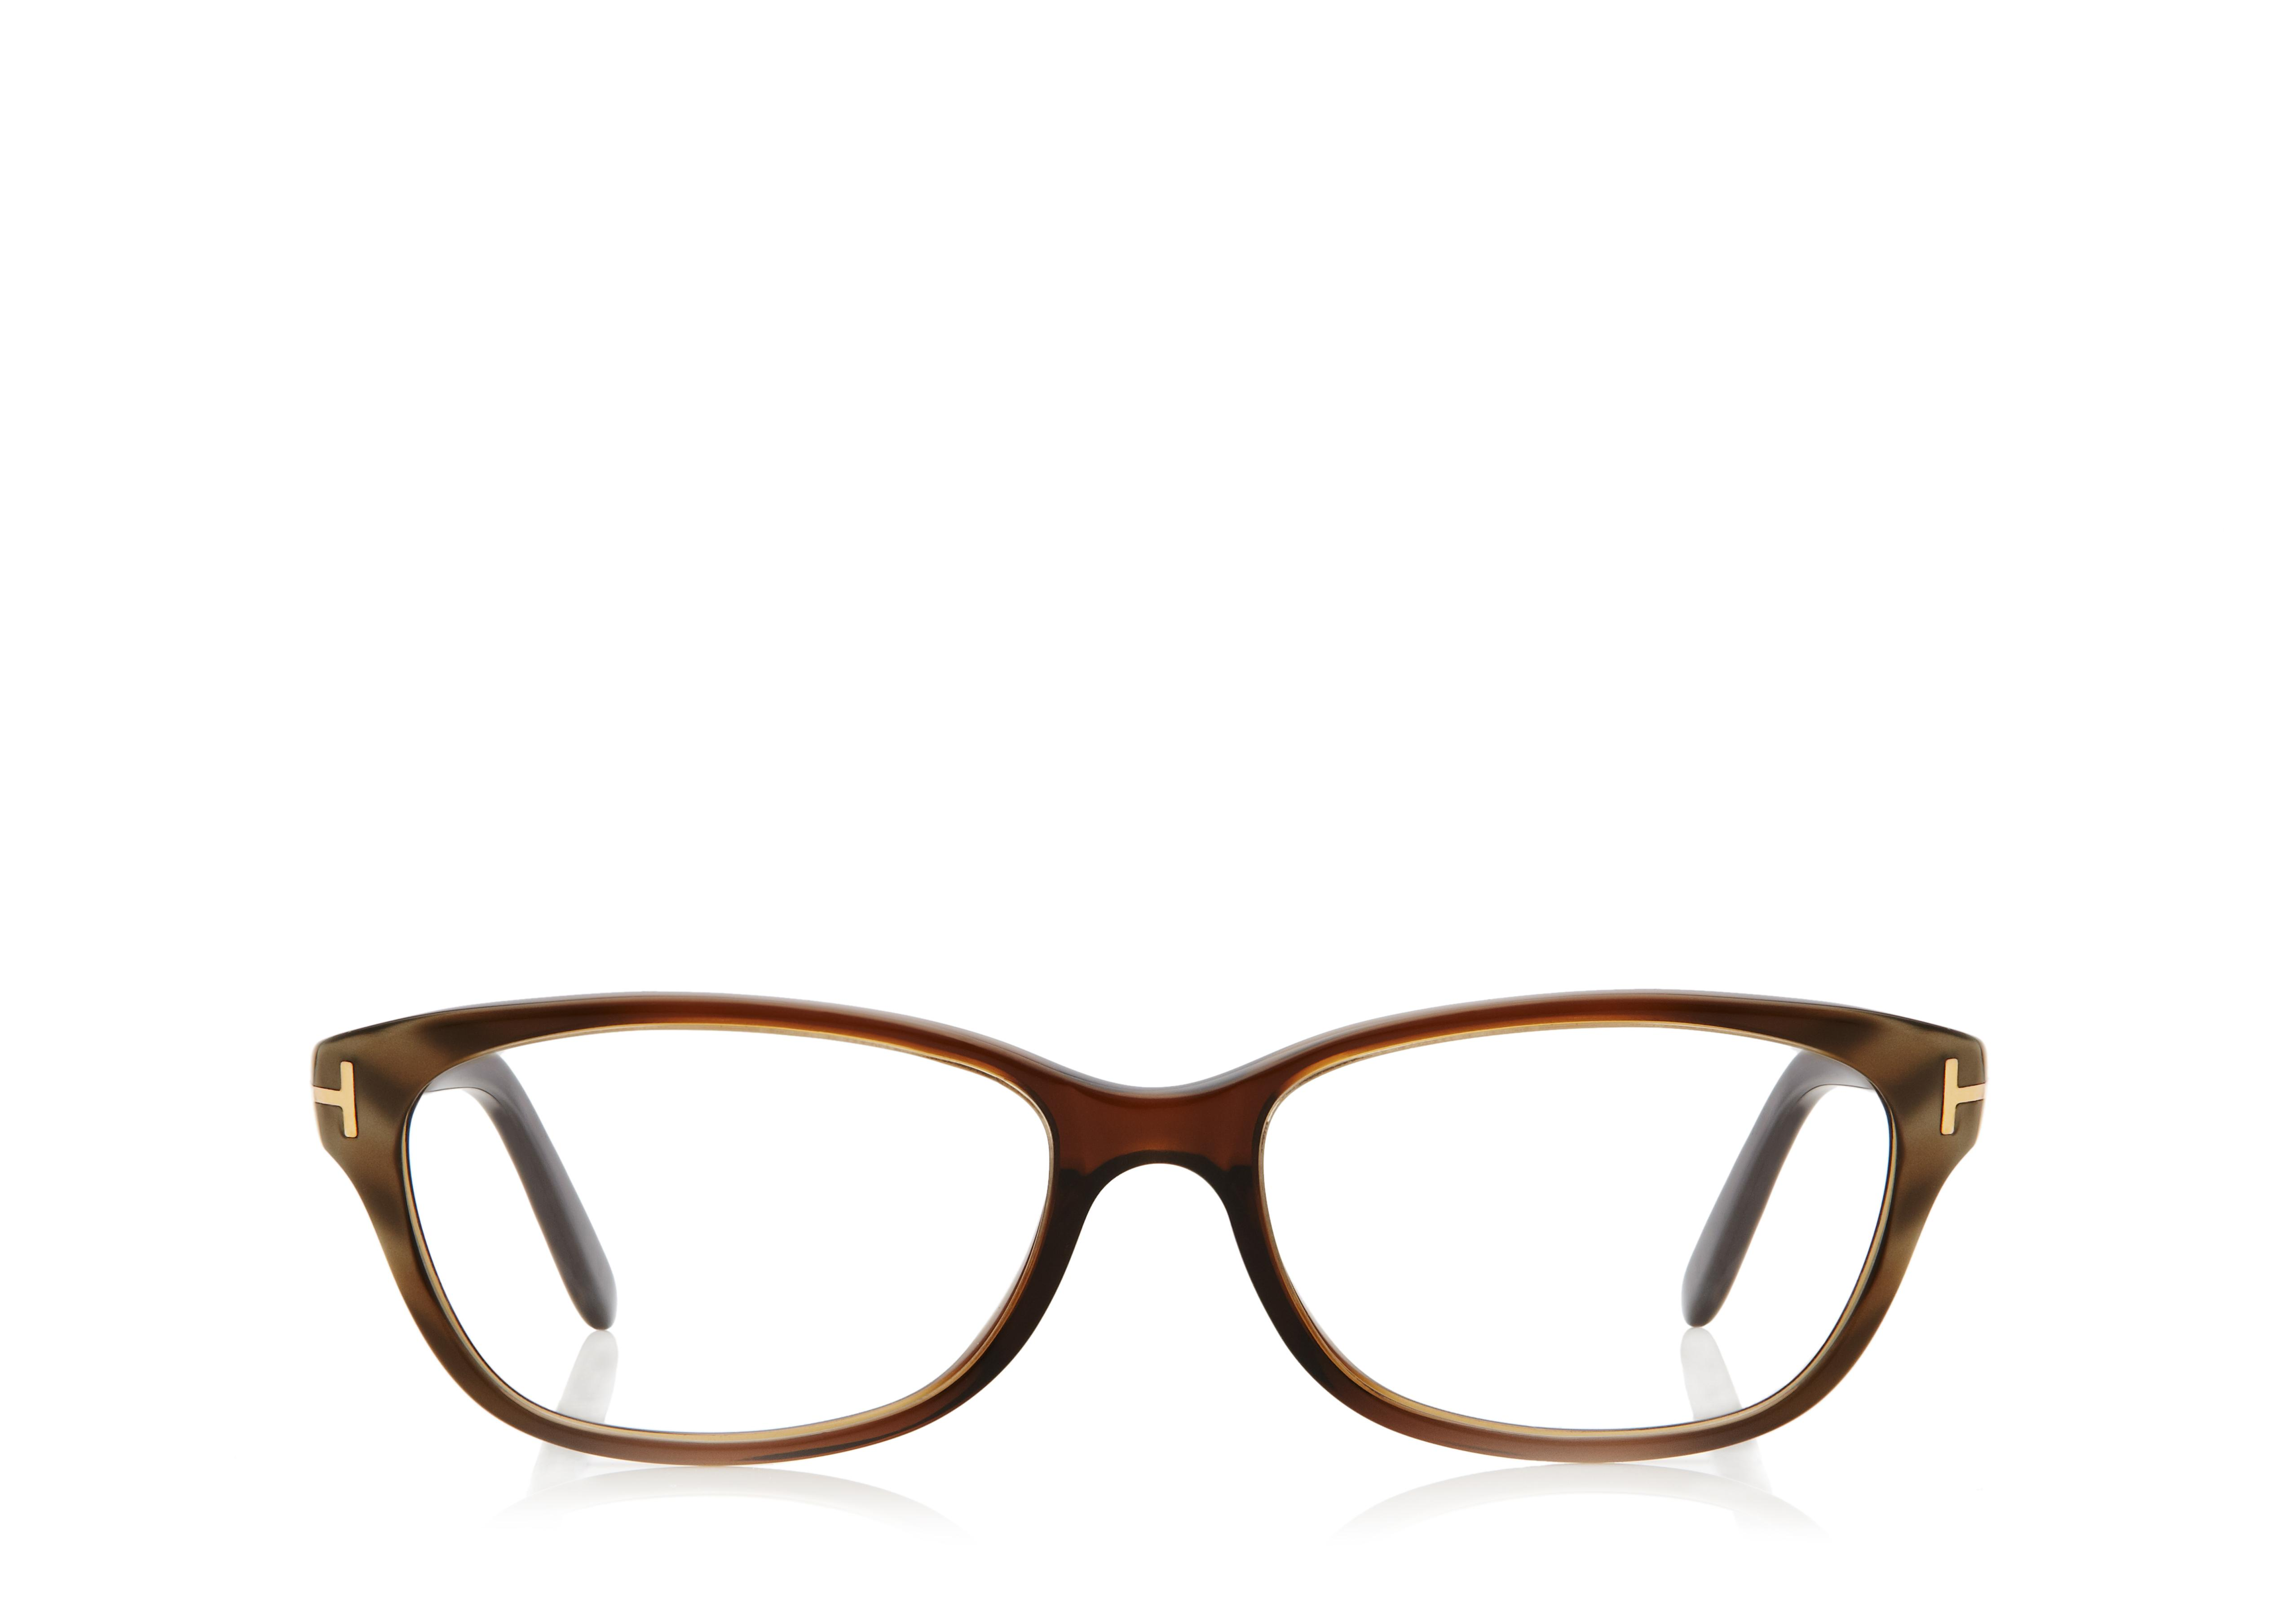 b2c30d419f6b Tom Ford Square Optical Frame